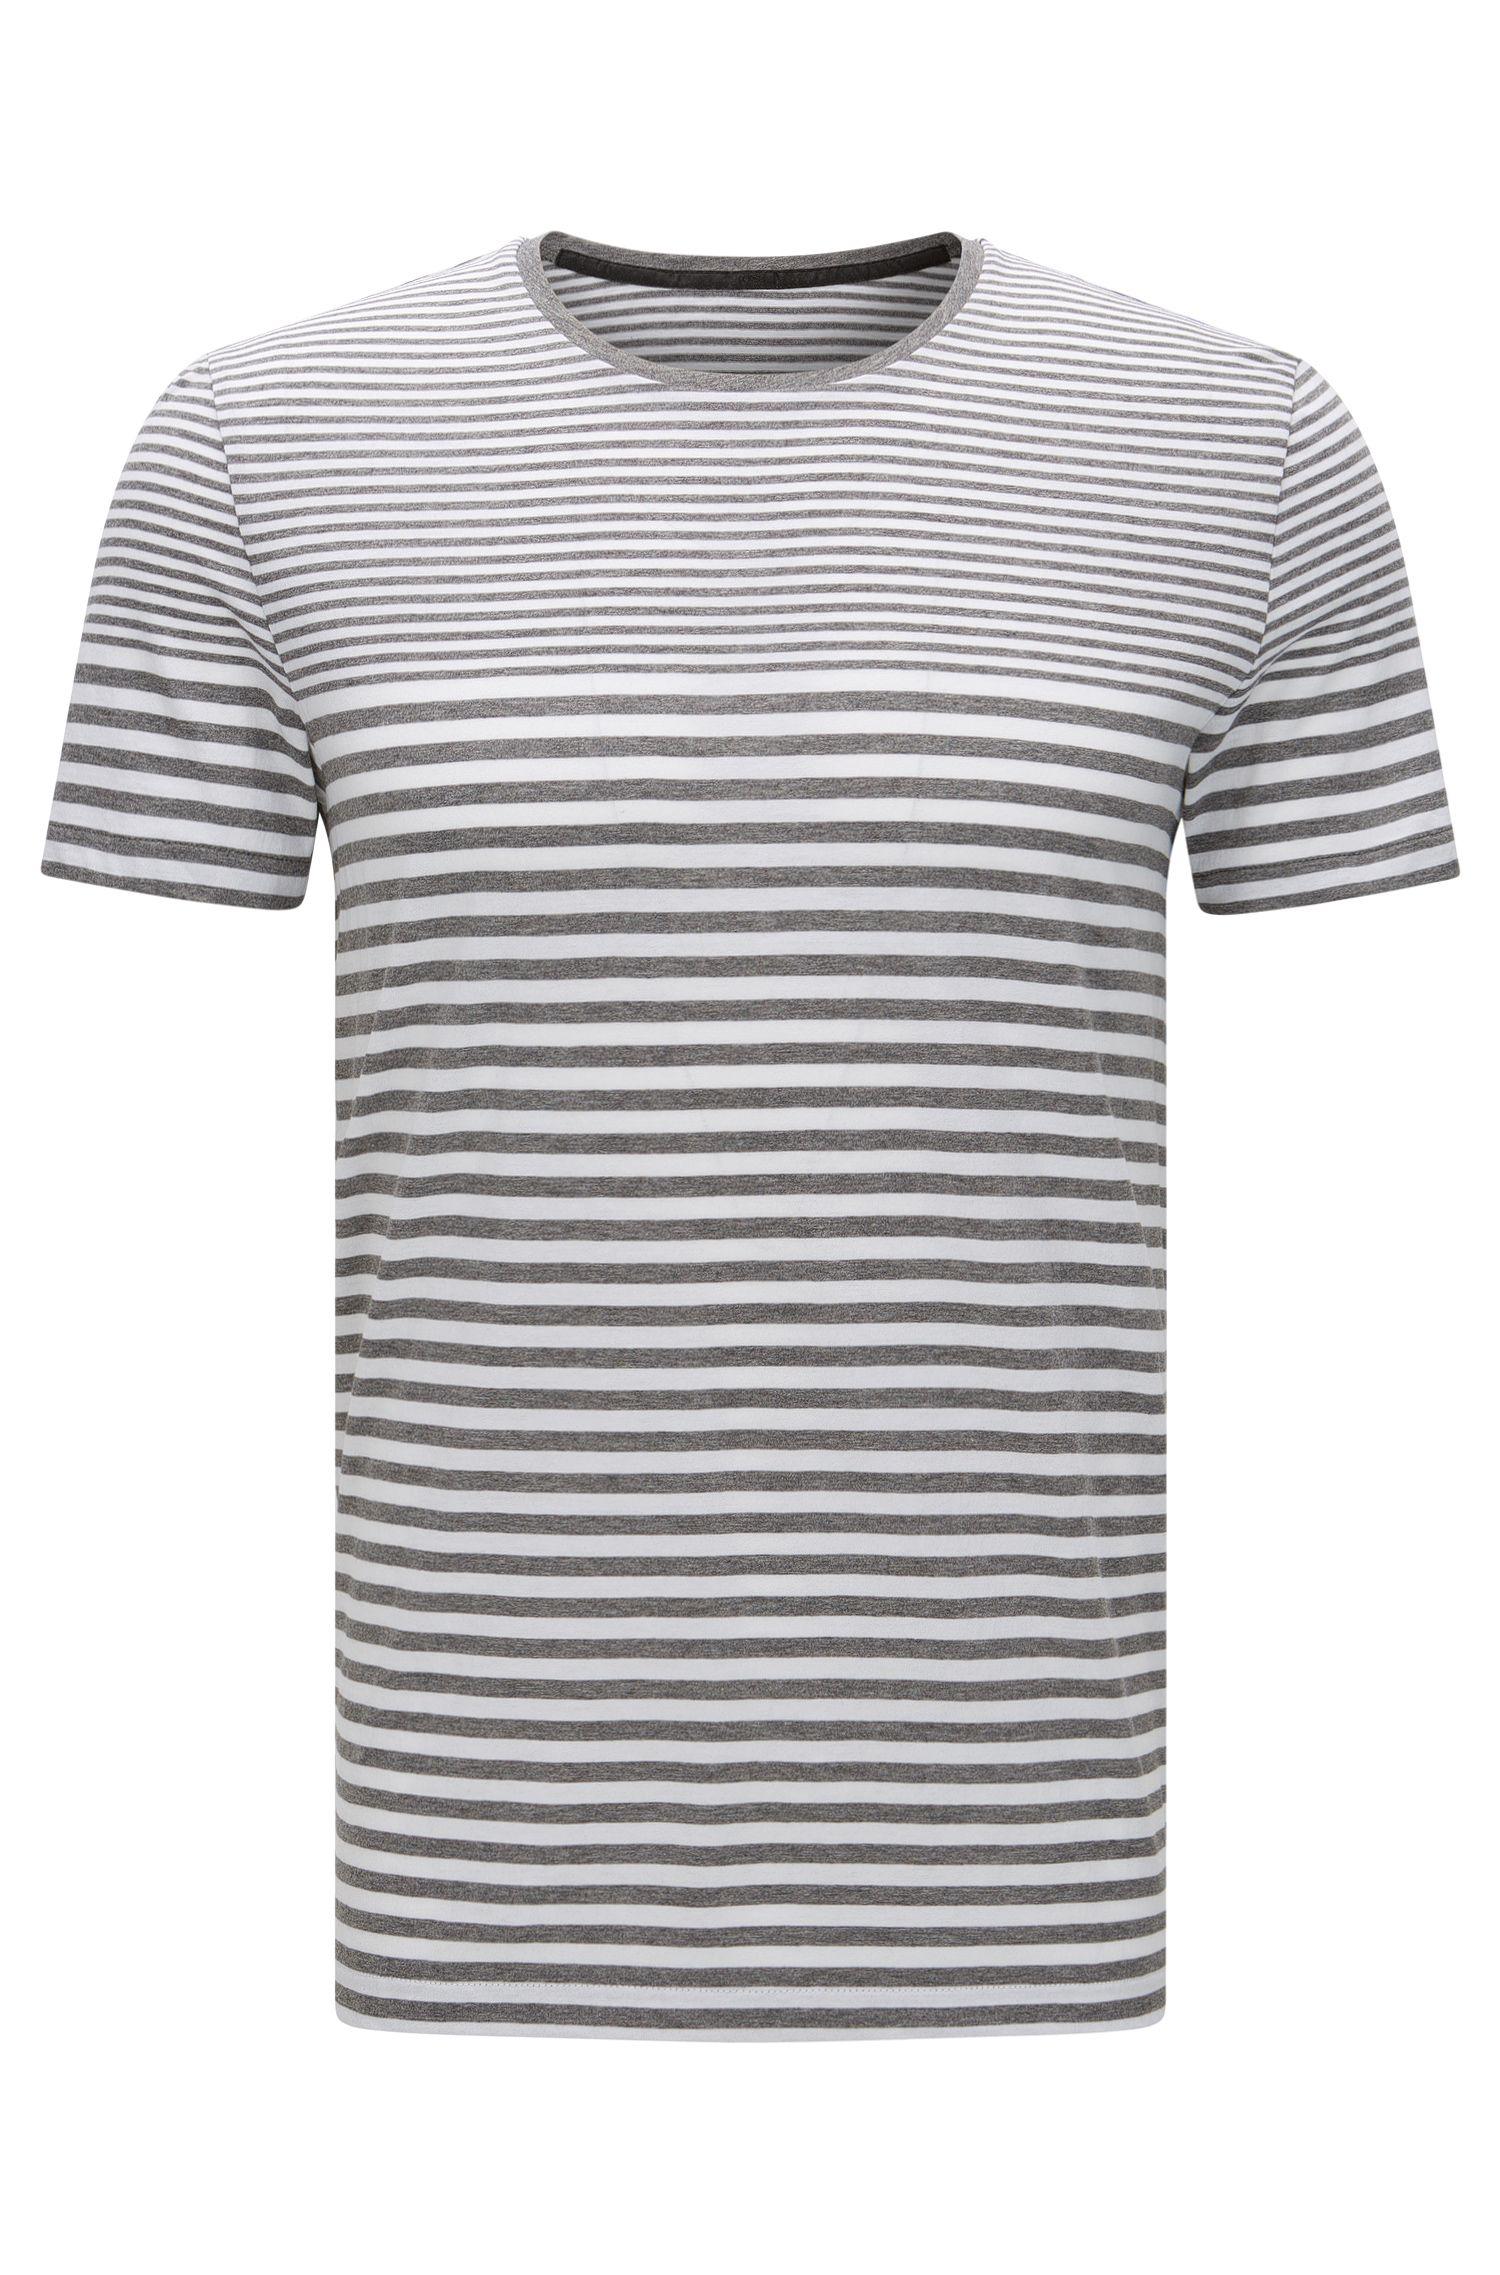 Cotton Engineered Stripe T-Shirt | Tessler WS